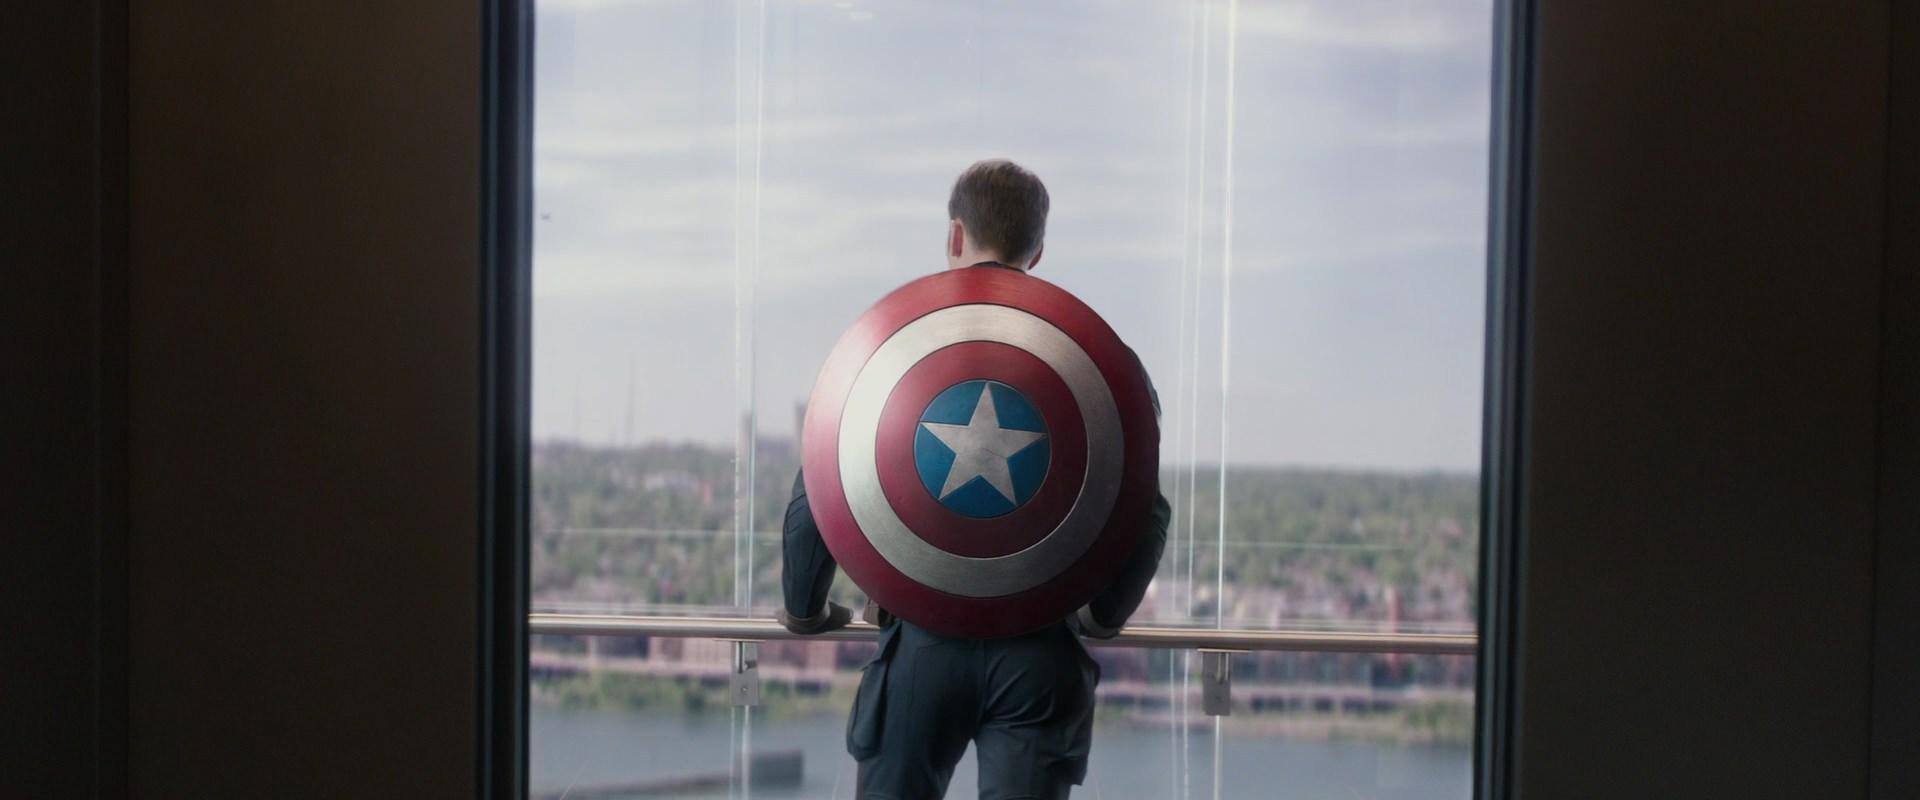 Chris Evans as Steve Rogers in Captain America: The Winter Soldier.